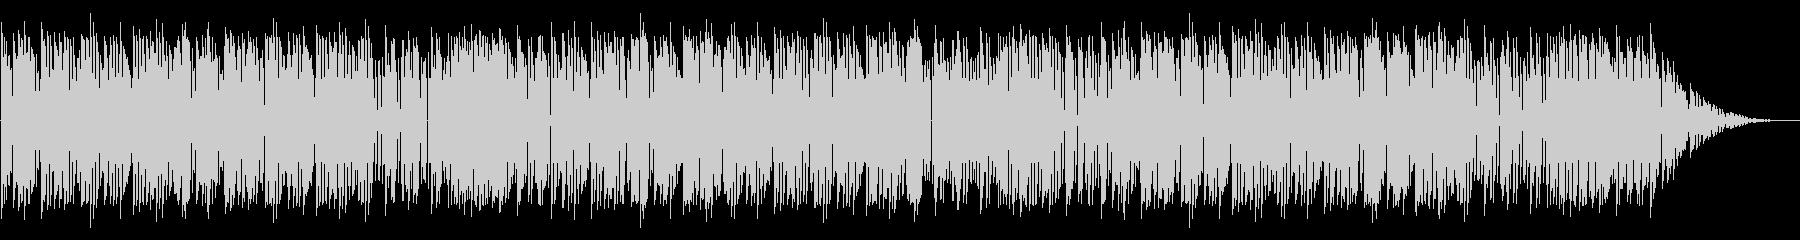 NES レース A04-1(ステージ3)の未再生の波形